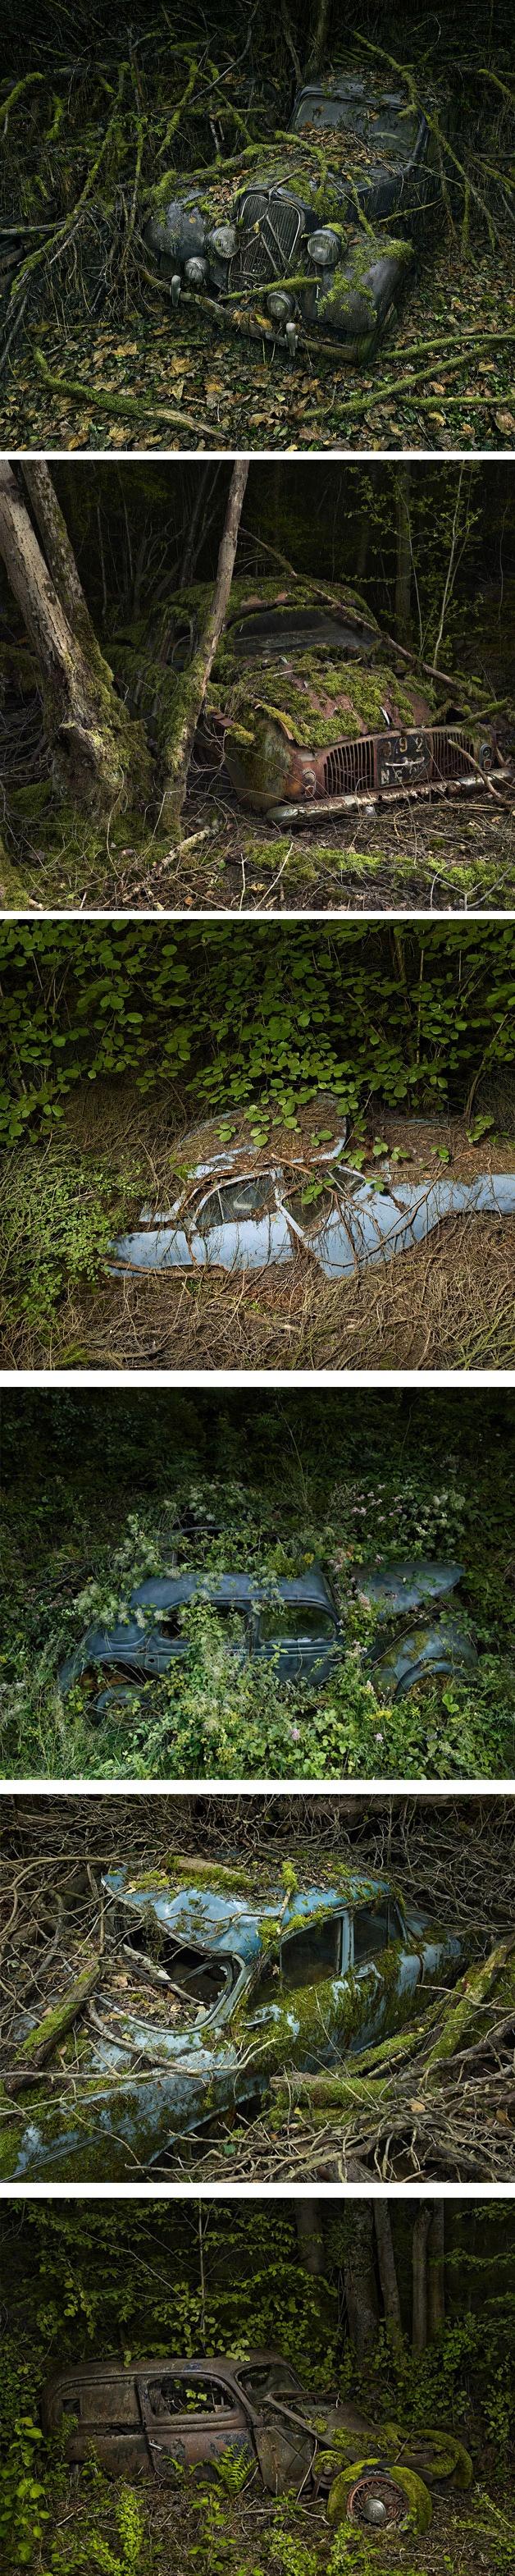 Carros abandonados engolidos pela natureza.